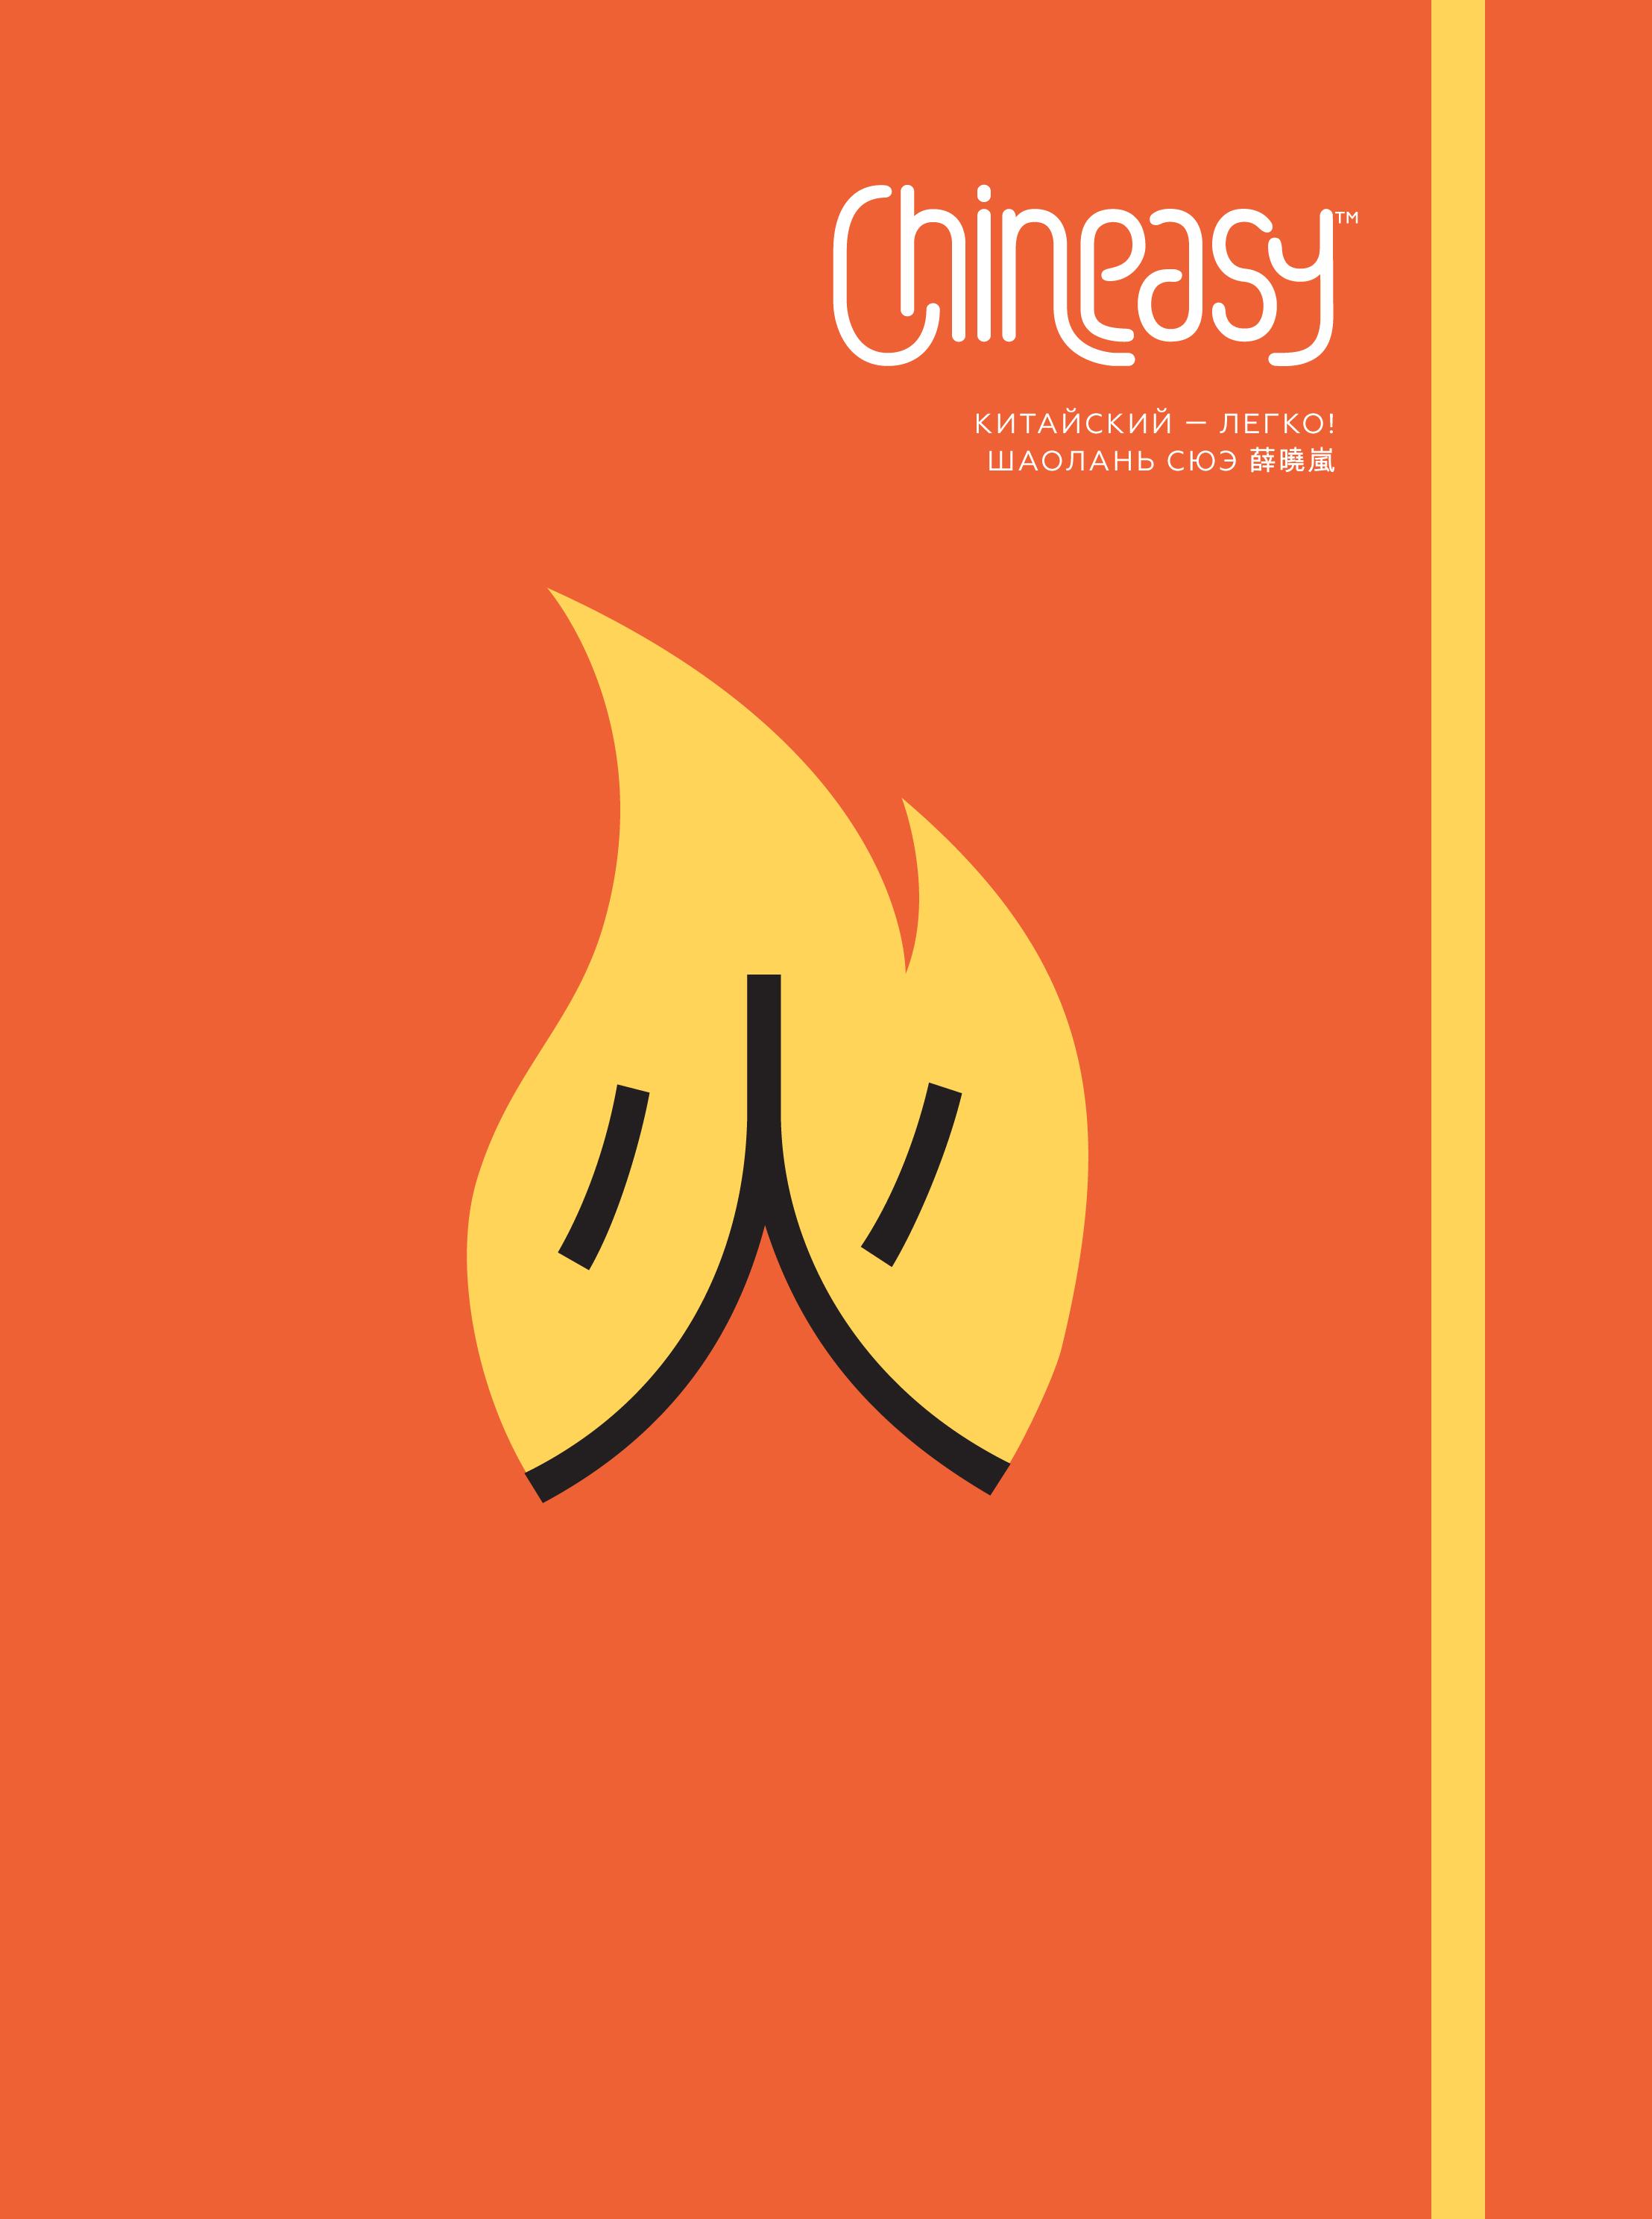 Chineasy. Китайский - легко! ( Сюэ Ш.  )